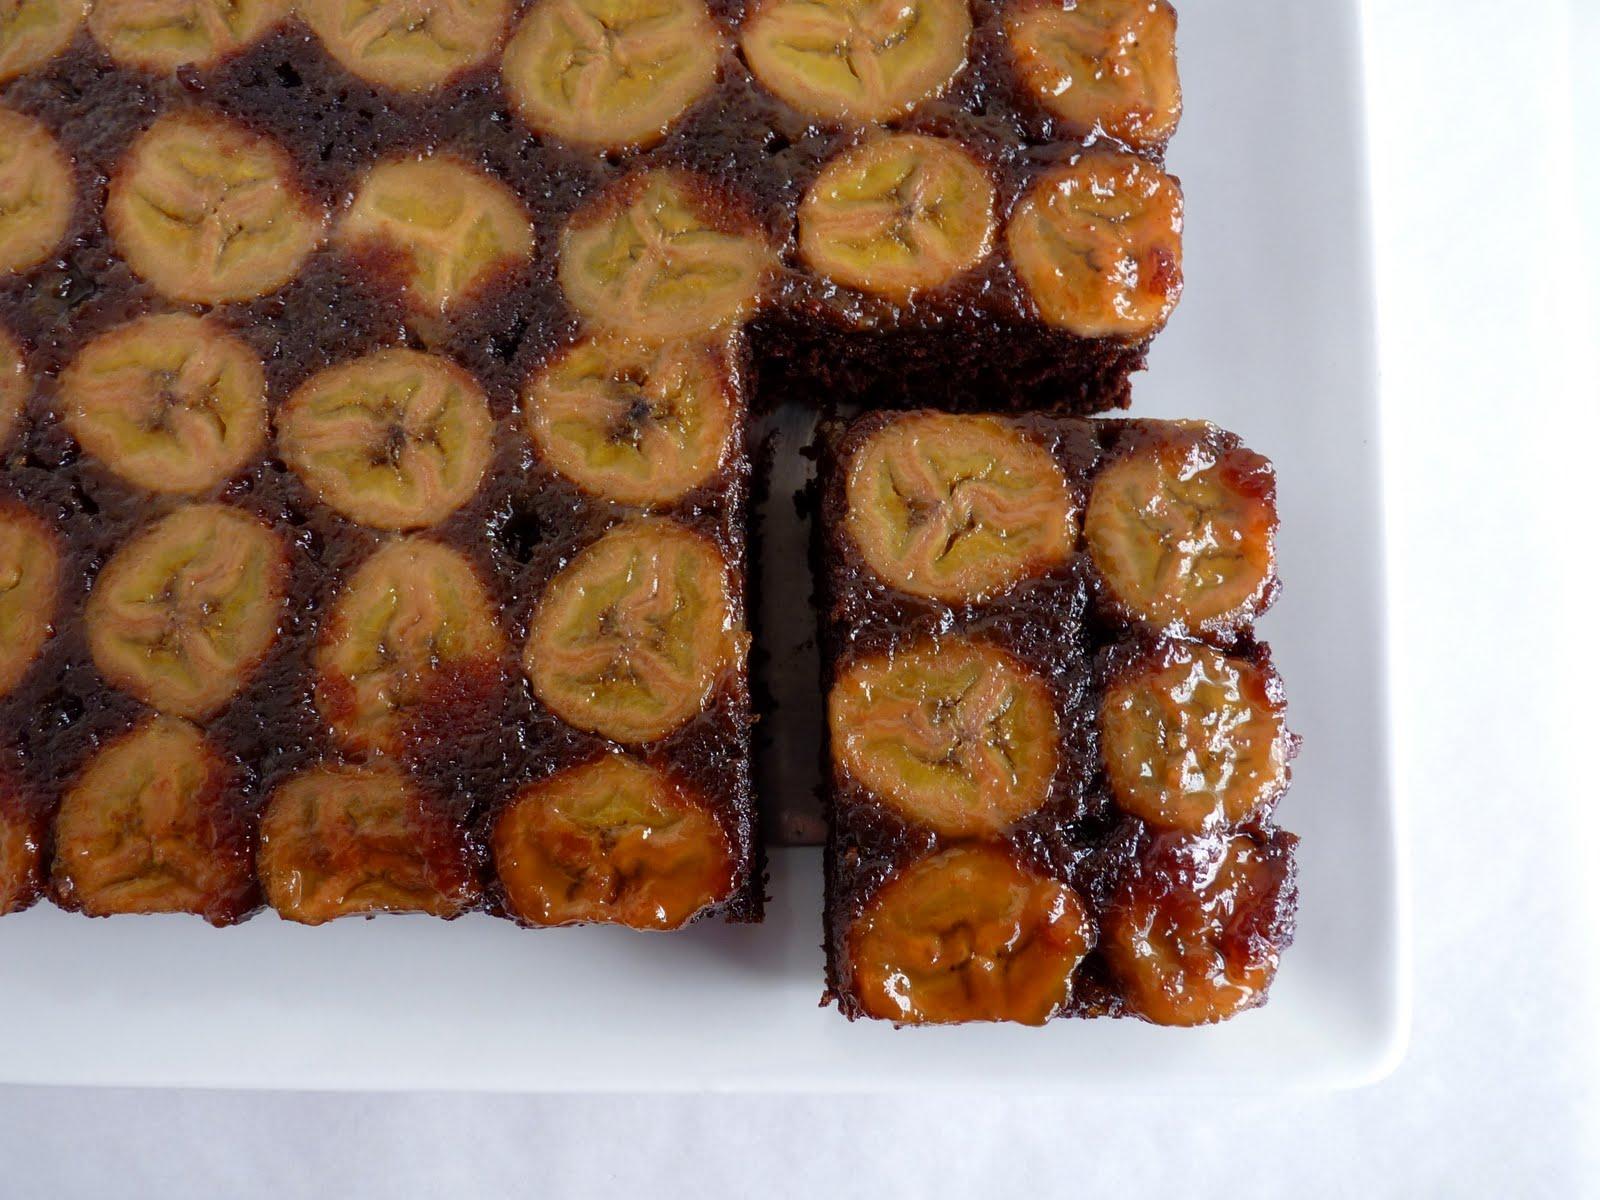 banana upside down cake upside down cake pineapple upside down cake ...